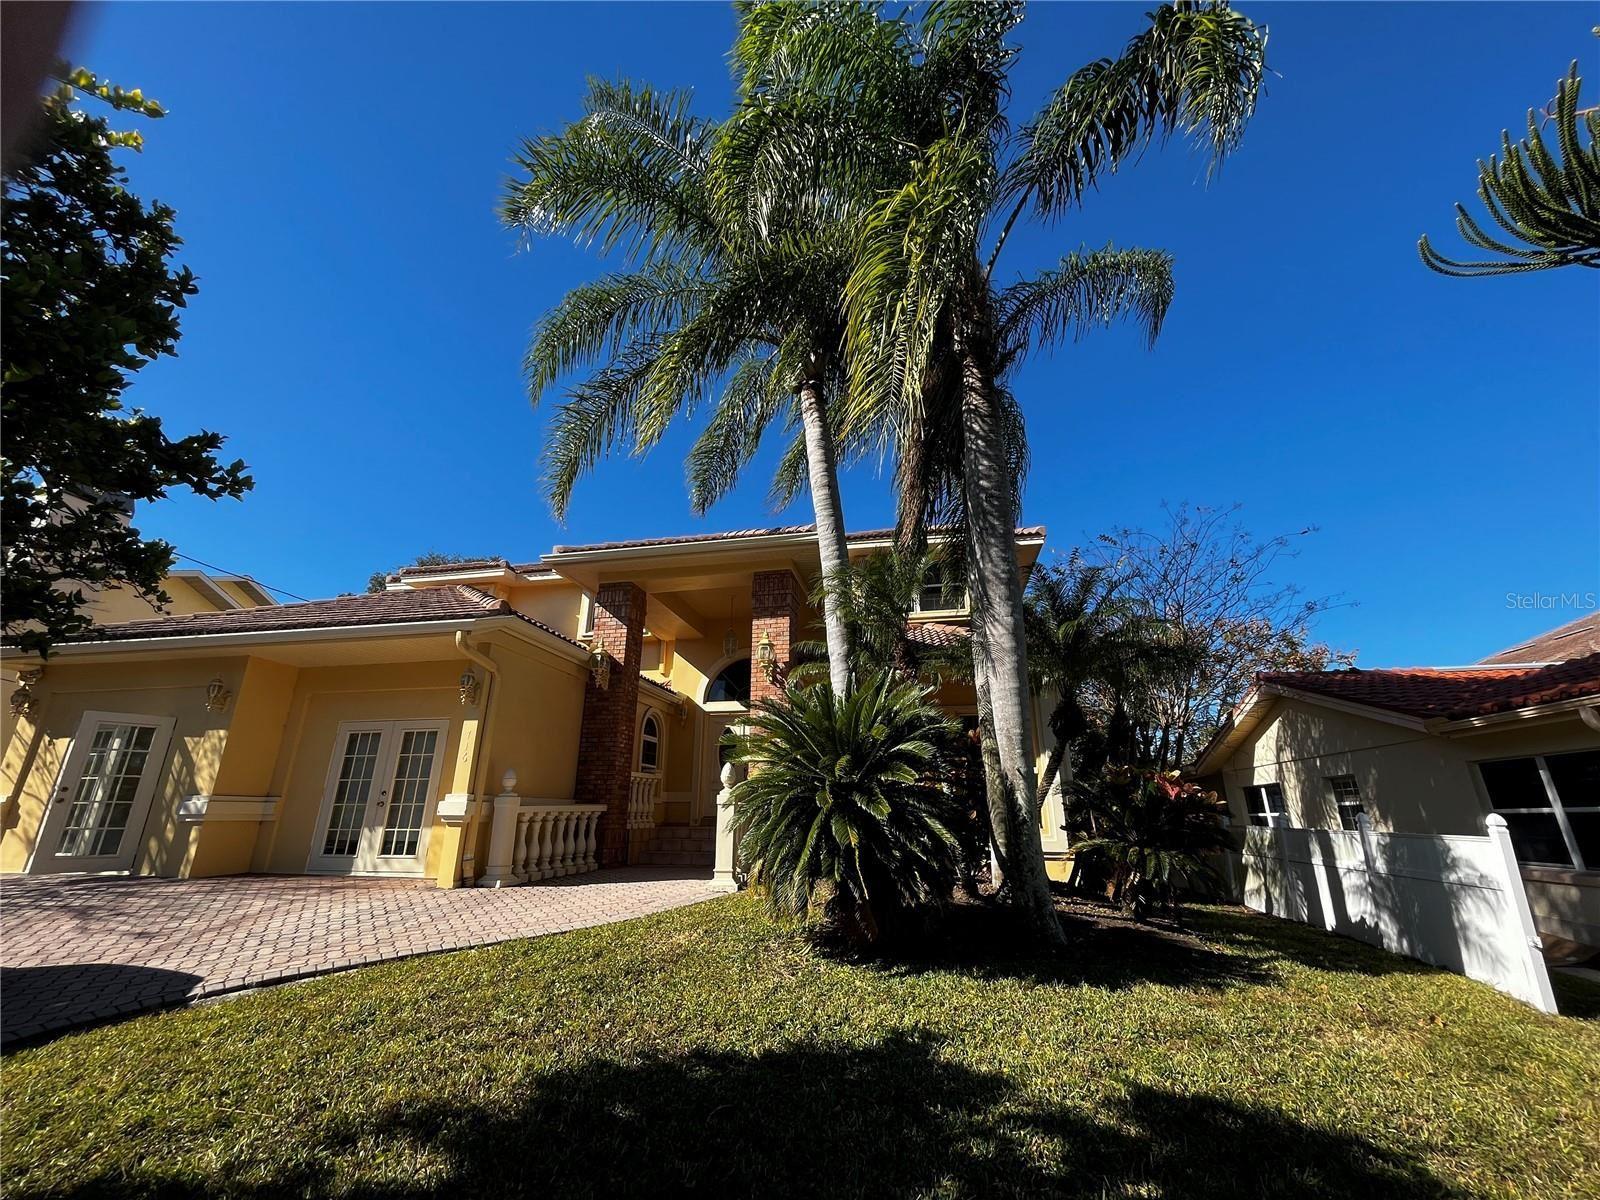 716 VIRGINIA AVENUE, Tarpon Springs, FL 34689 - MLS#: U8134627